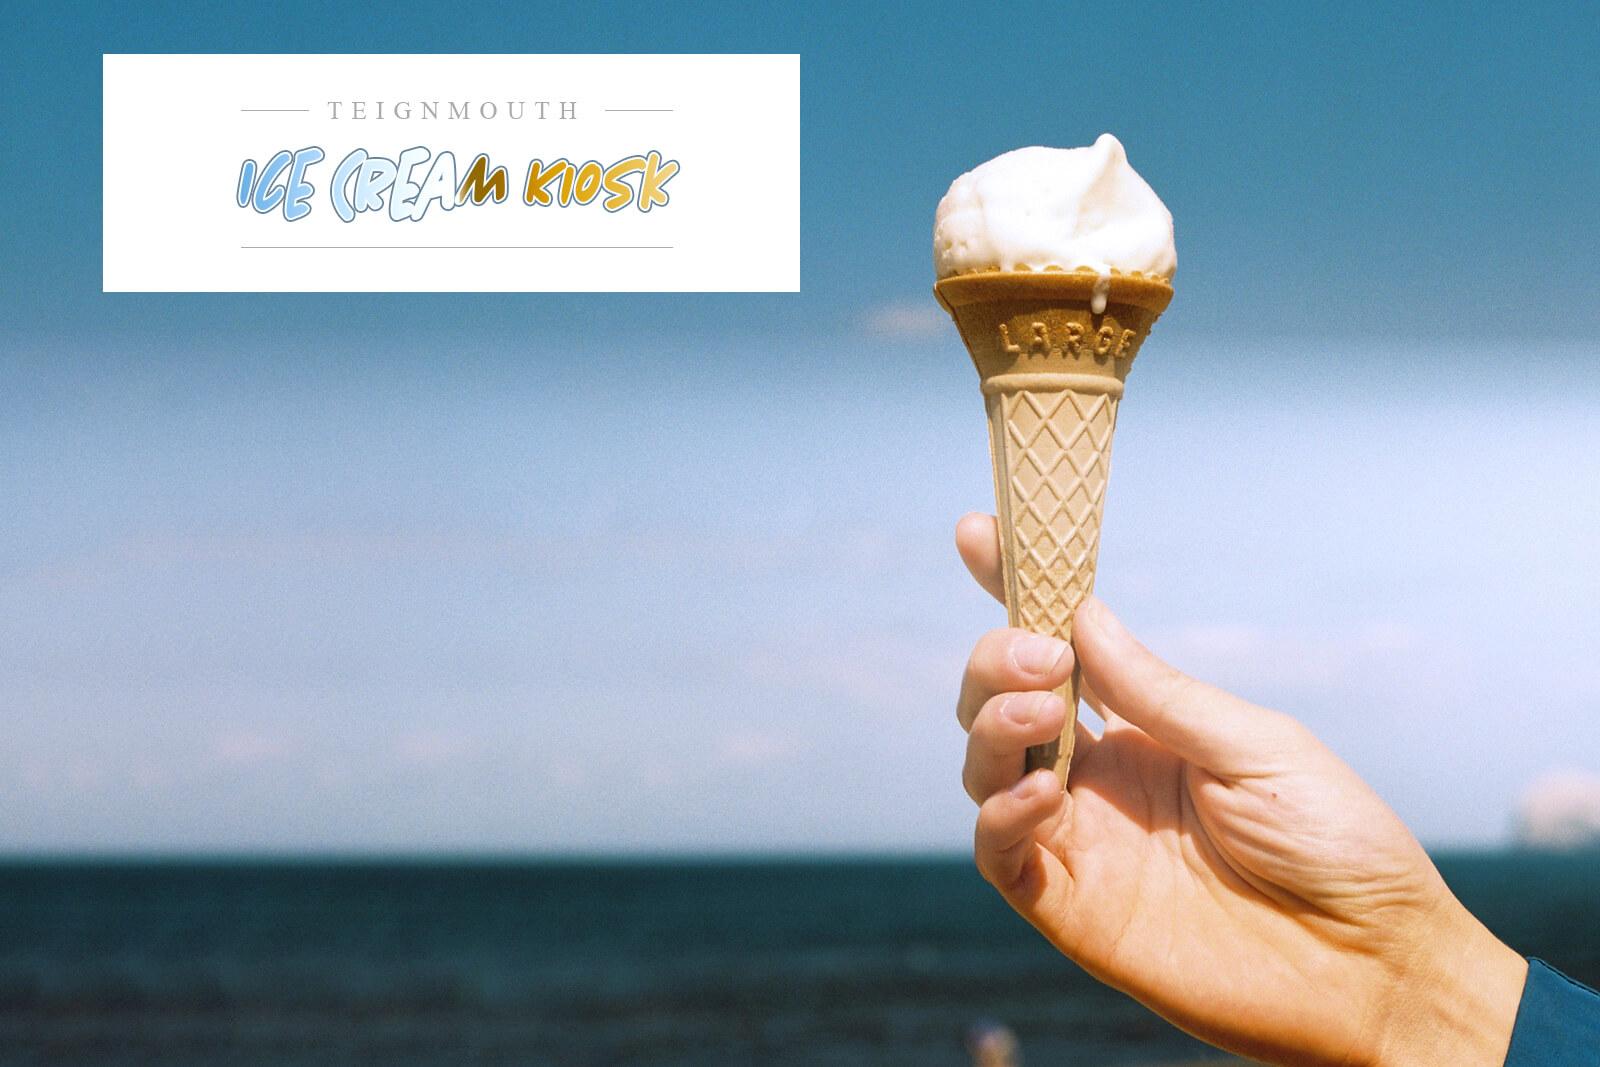 Teignmouth ice cream. Teignmouth Airshow sponsor.